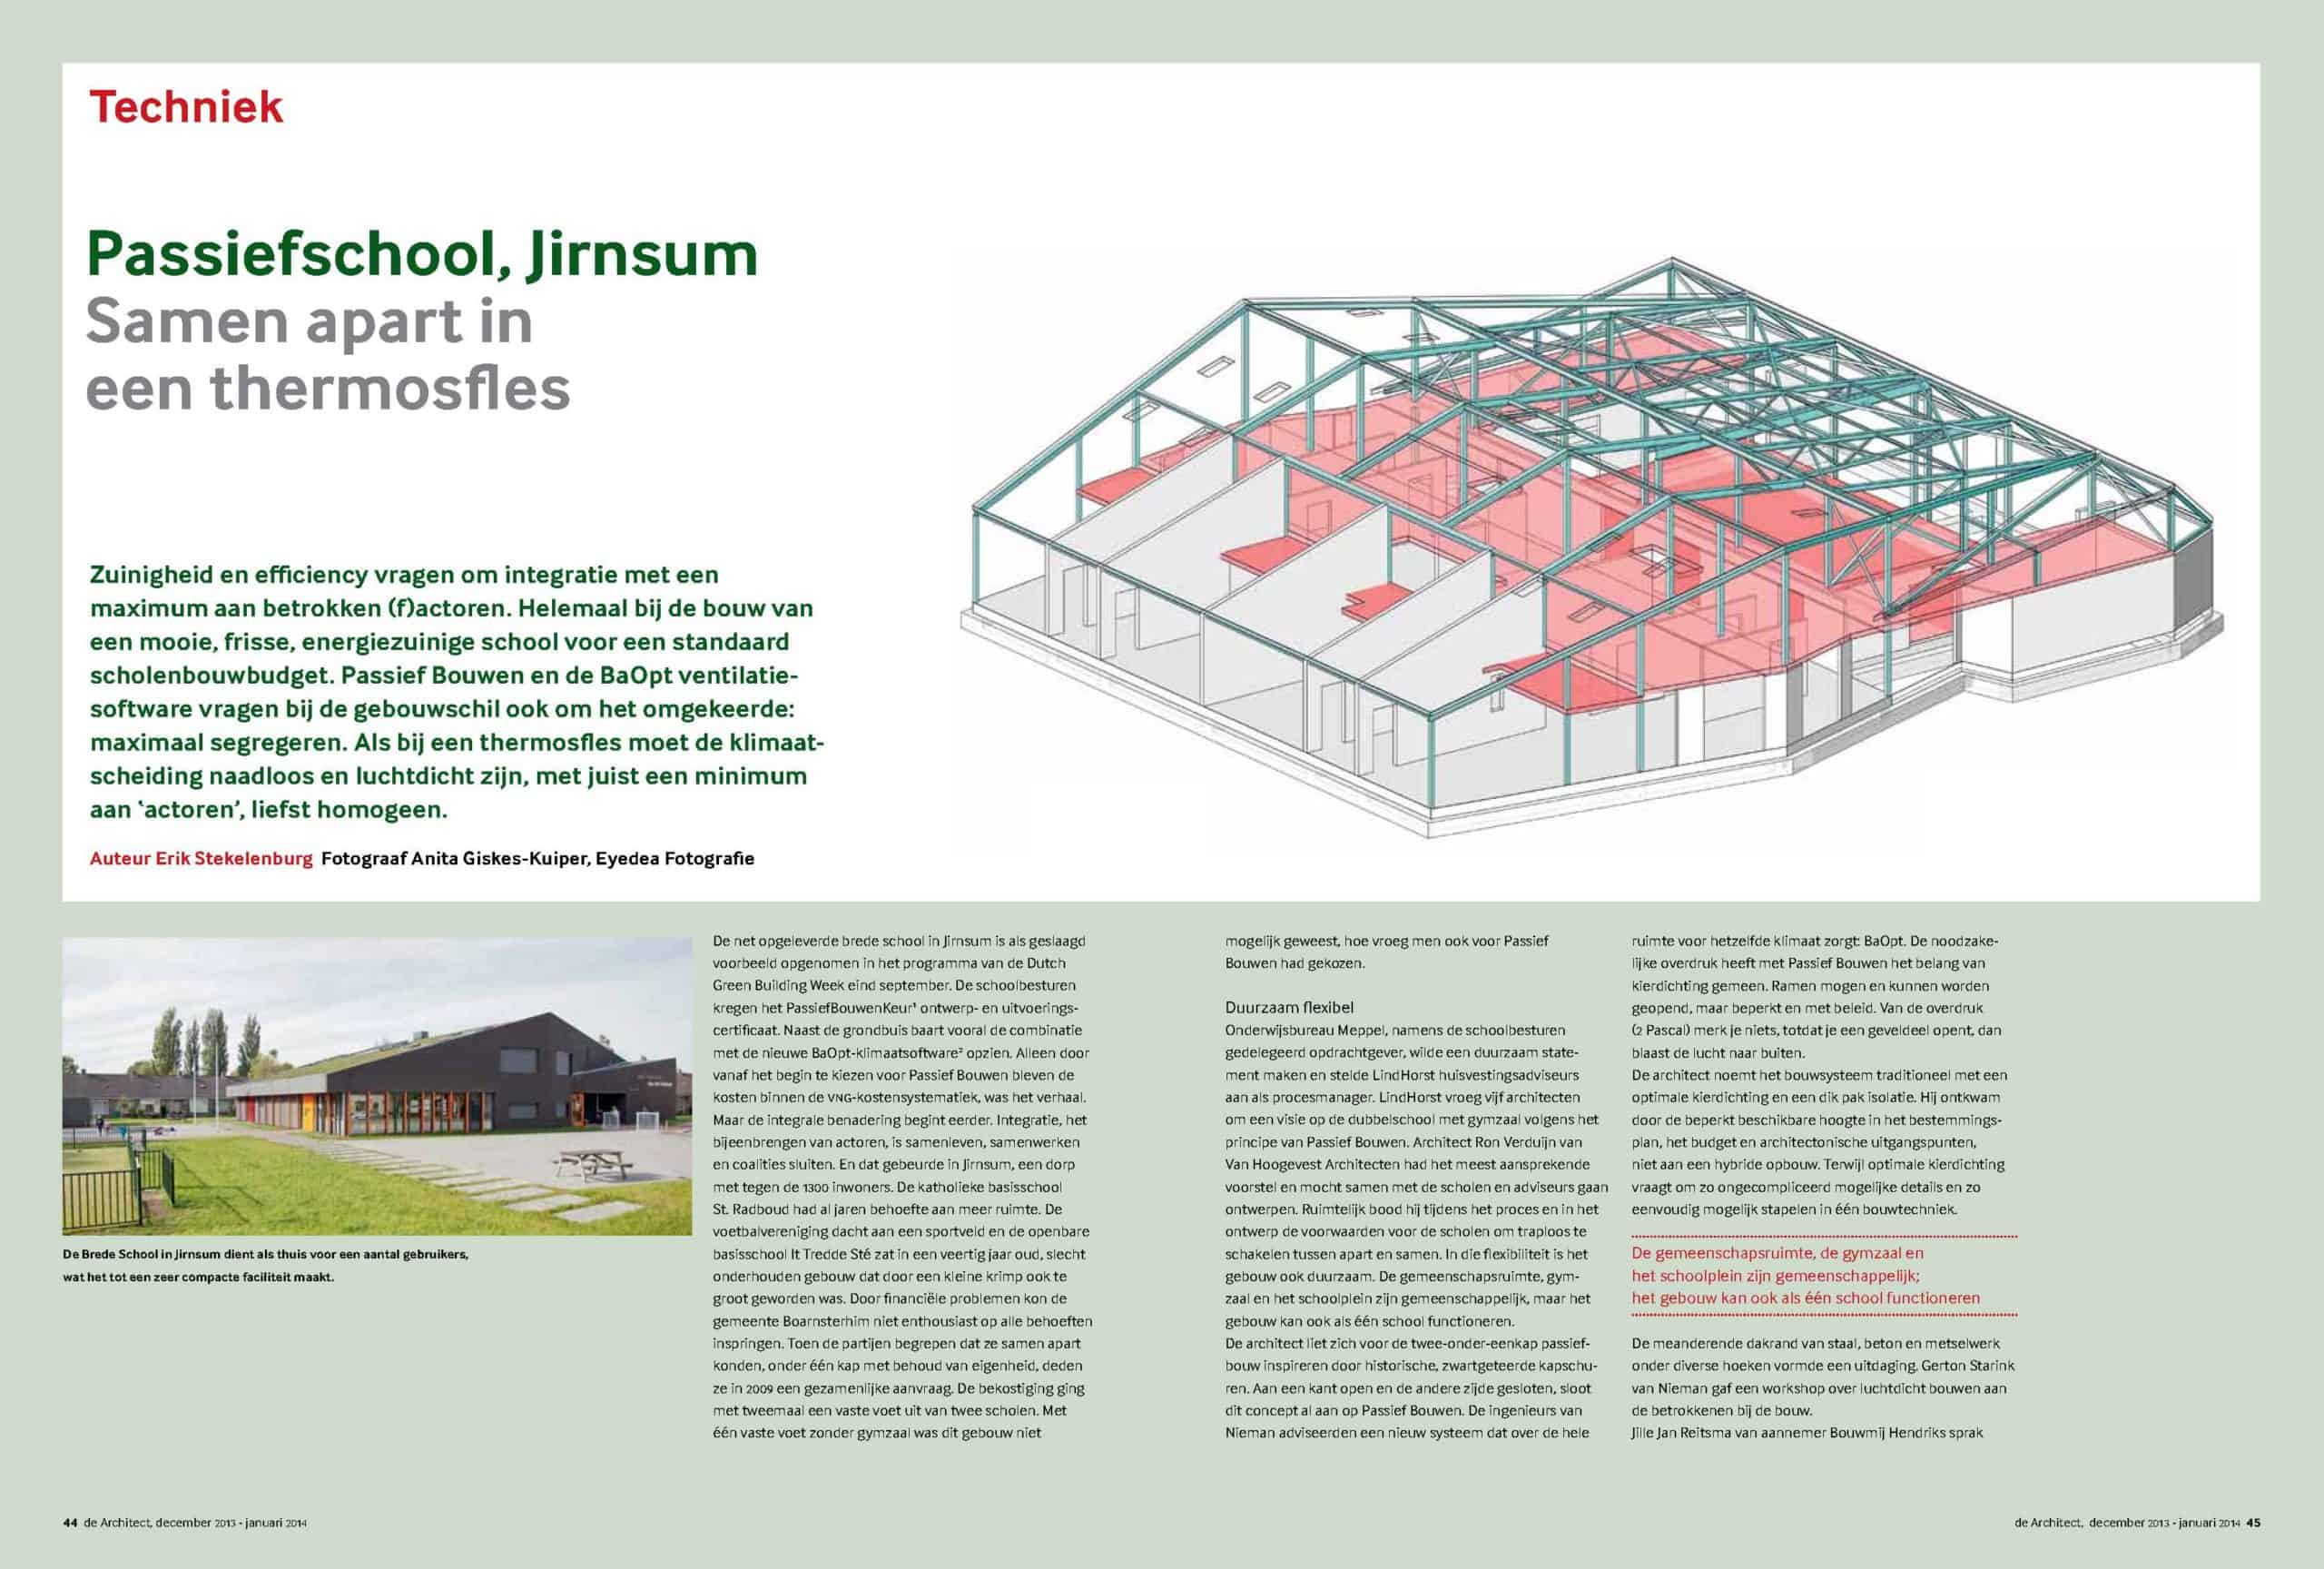 Architect_2013-12_Passiefschool-Jirnsum_1-3-scaled